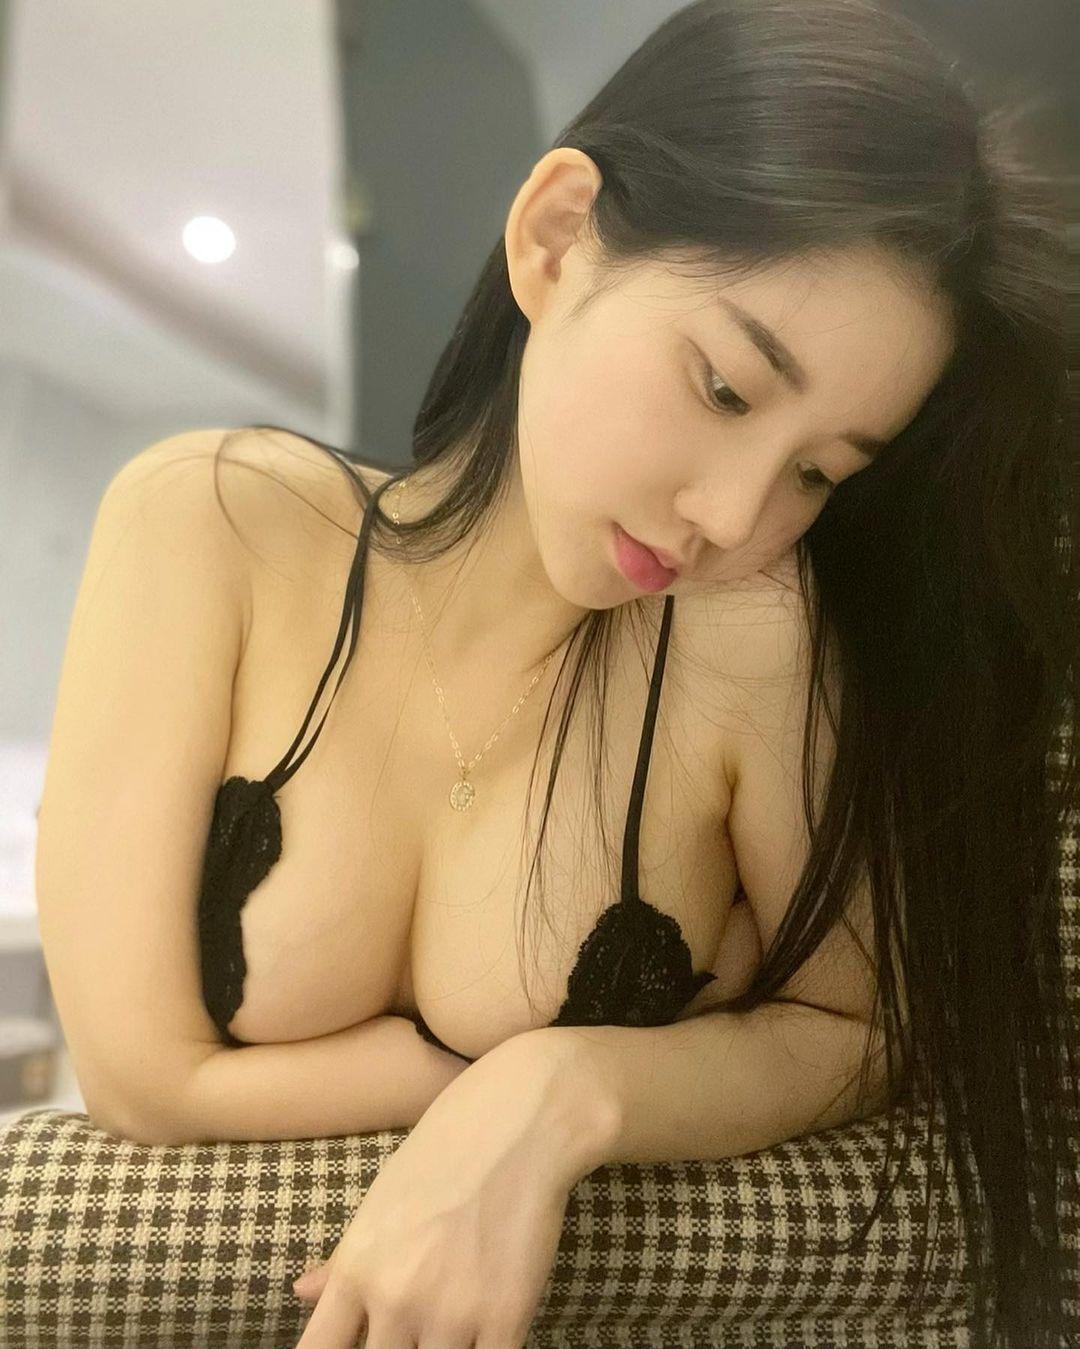 DJミユ「ブラ紐で胸を寄せて…」柔らかそうな美バストにファン注目【画像2枚】の画像001